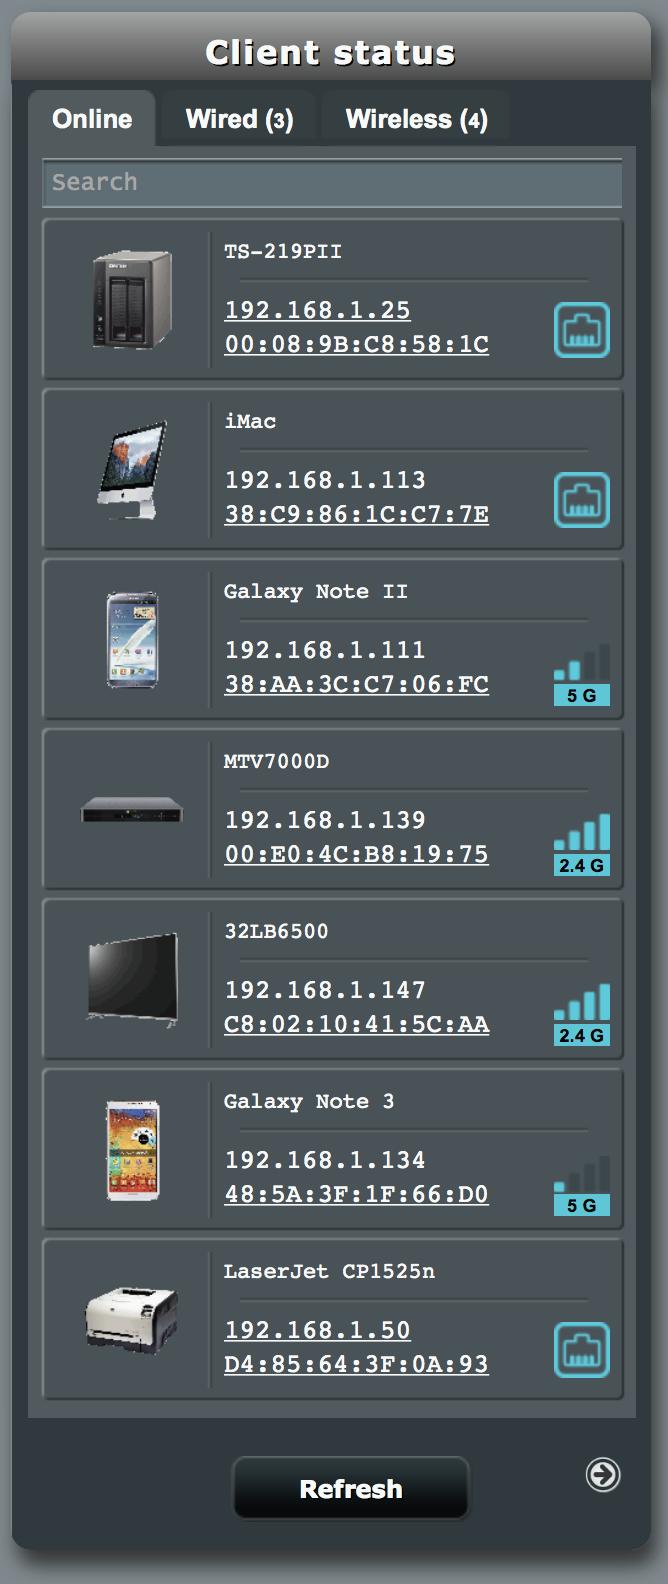 Additional Device Icons   SmallNetBuilder Forums